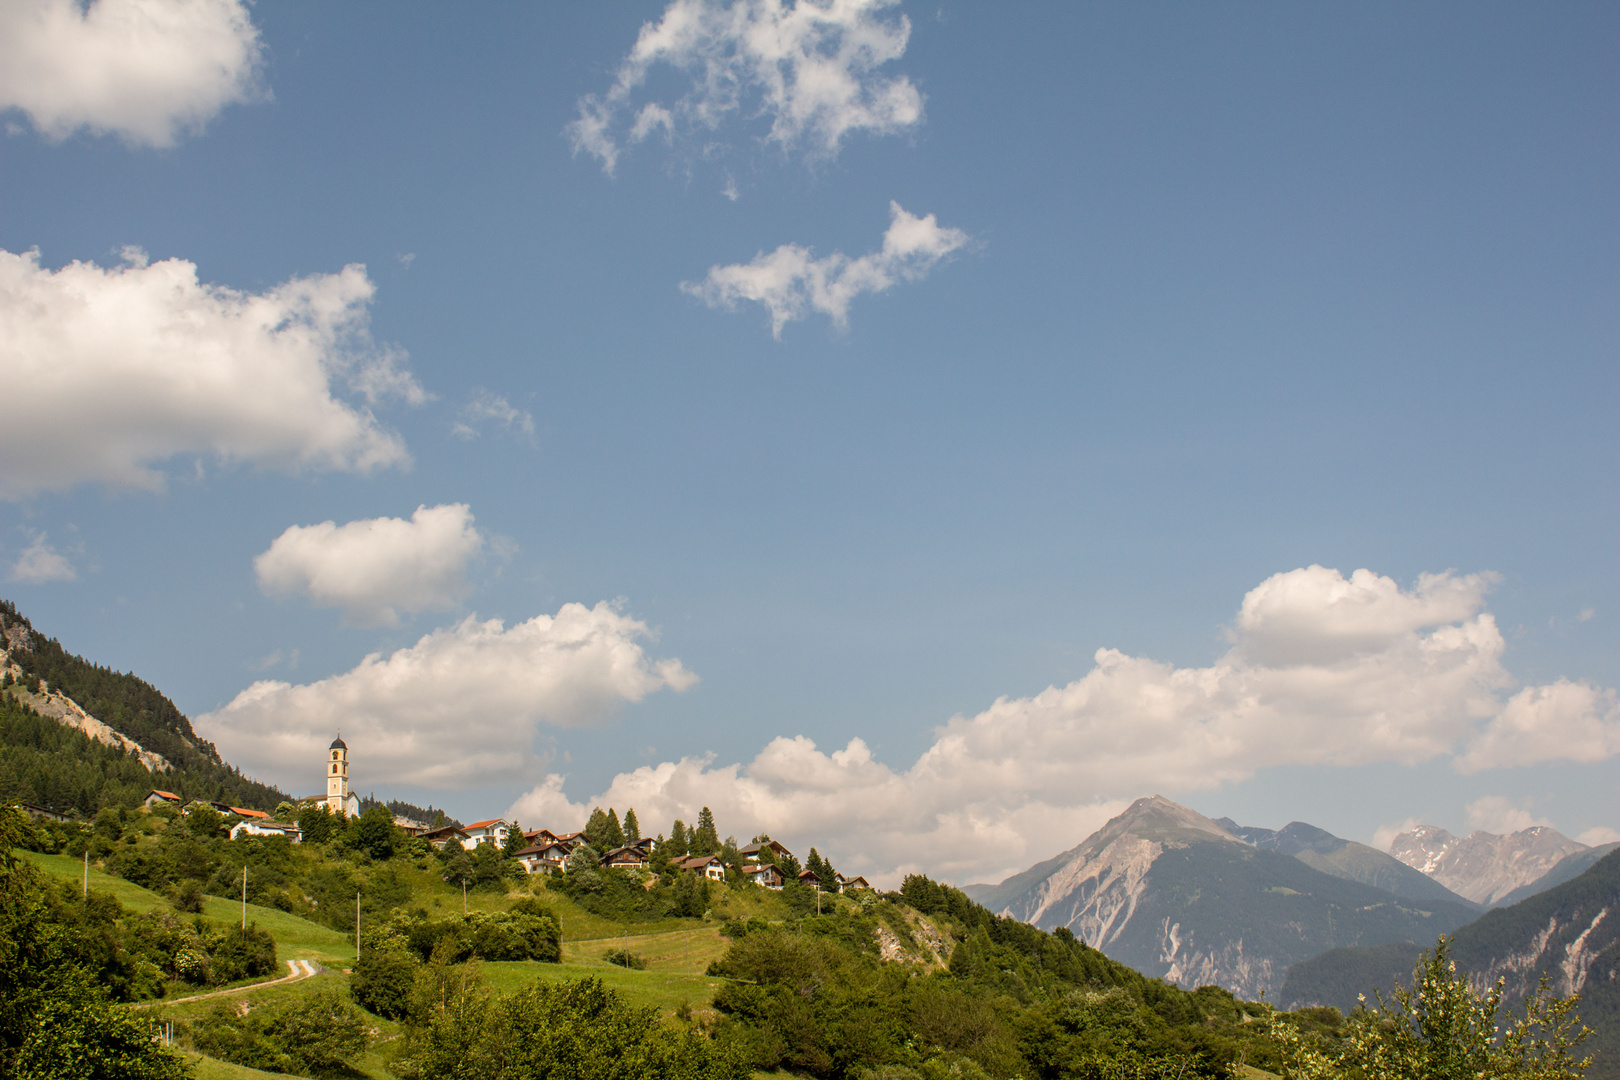 Berg Dörfchen